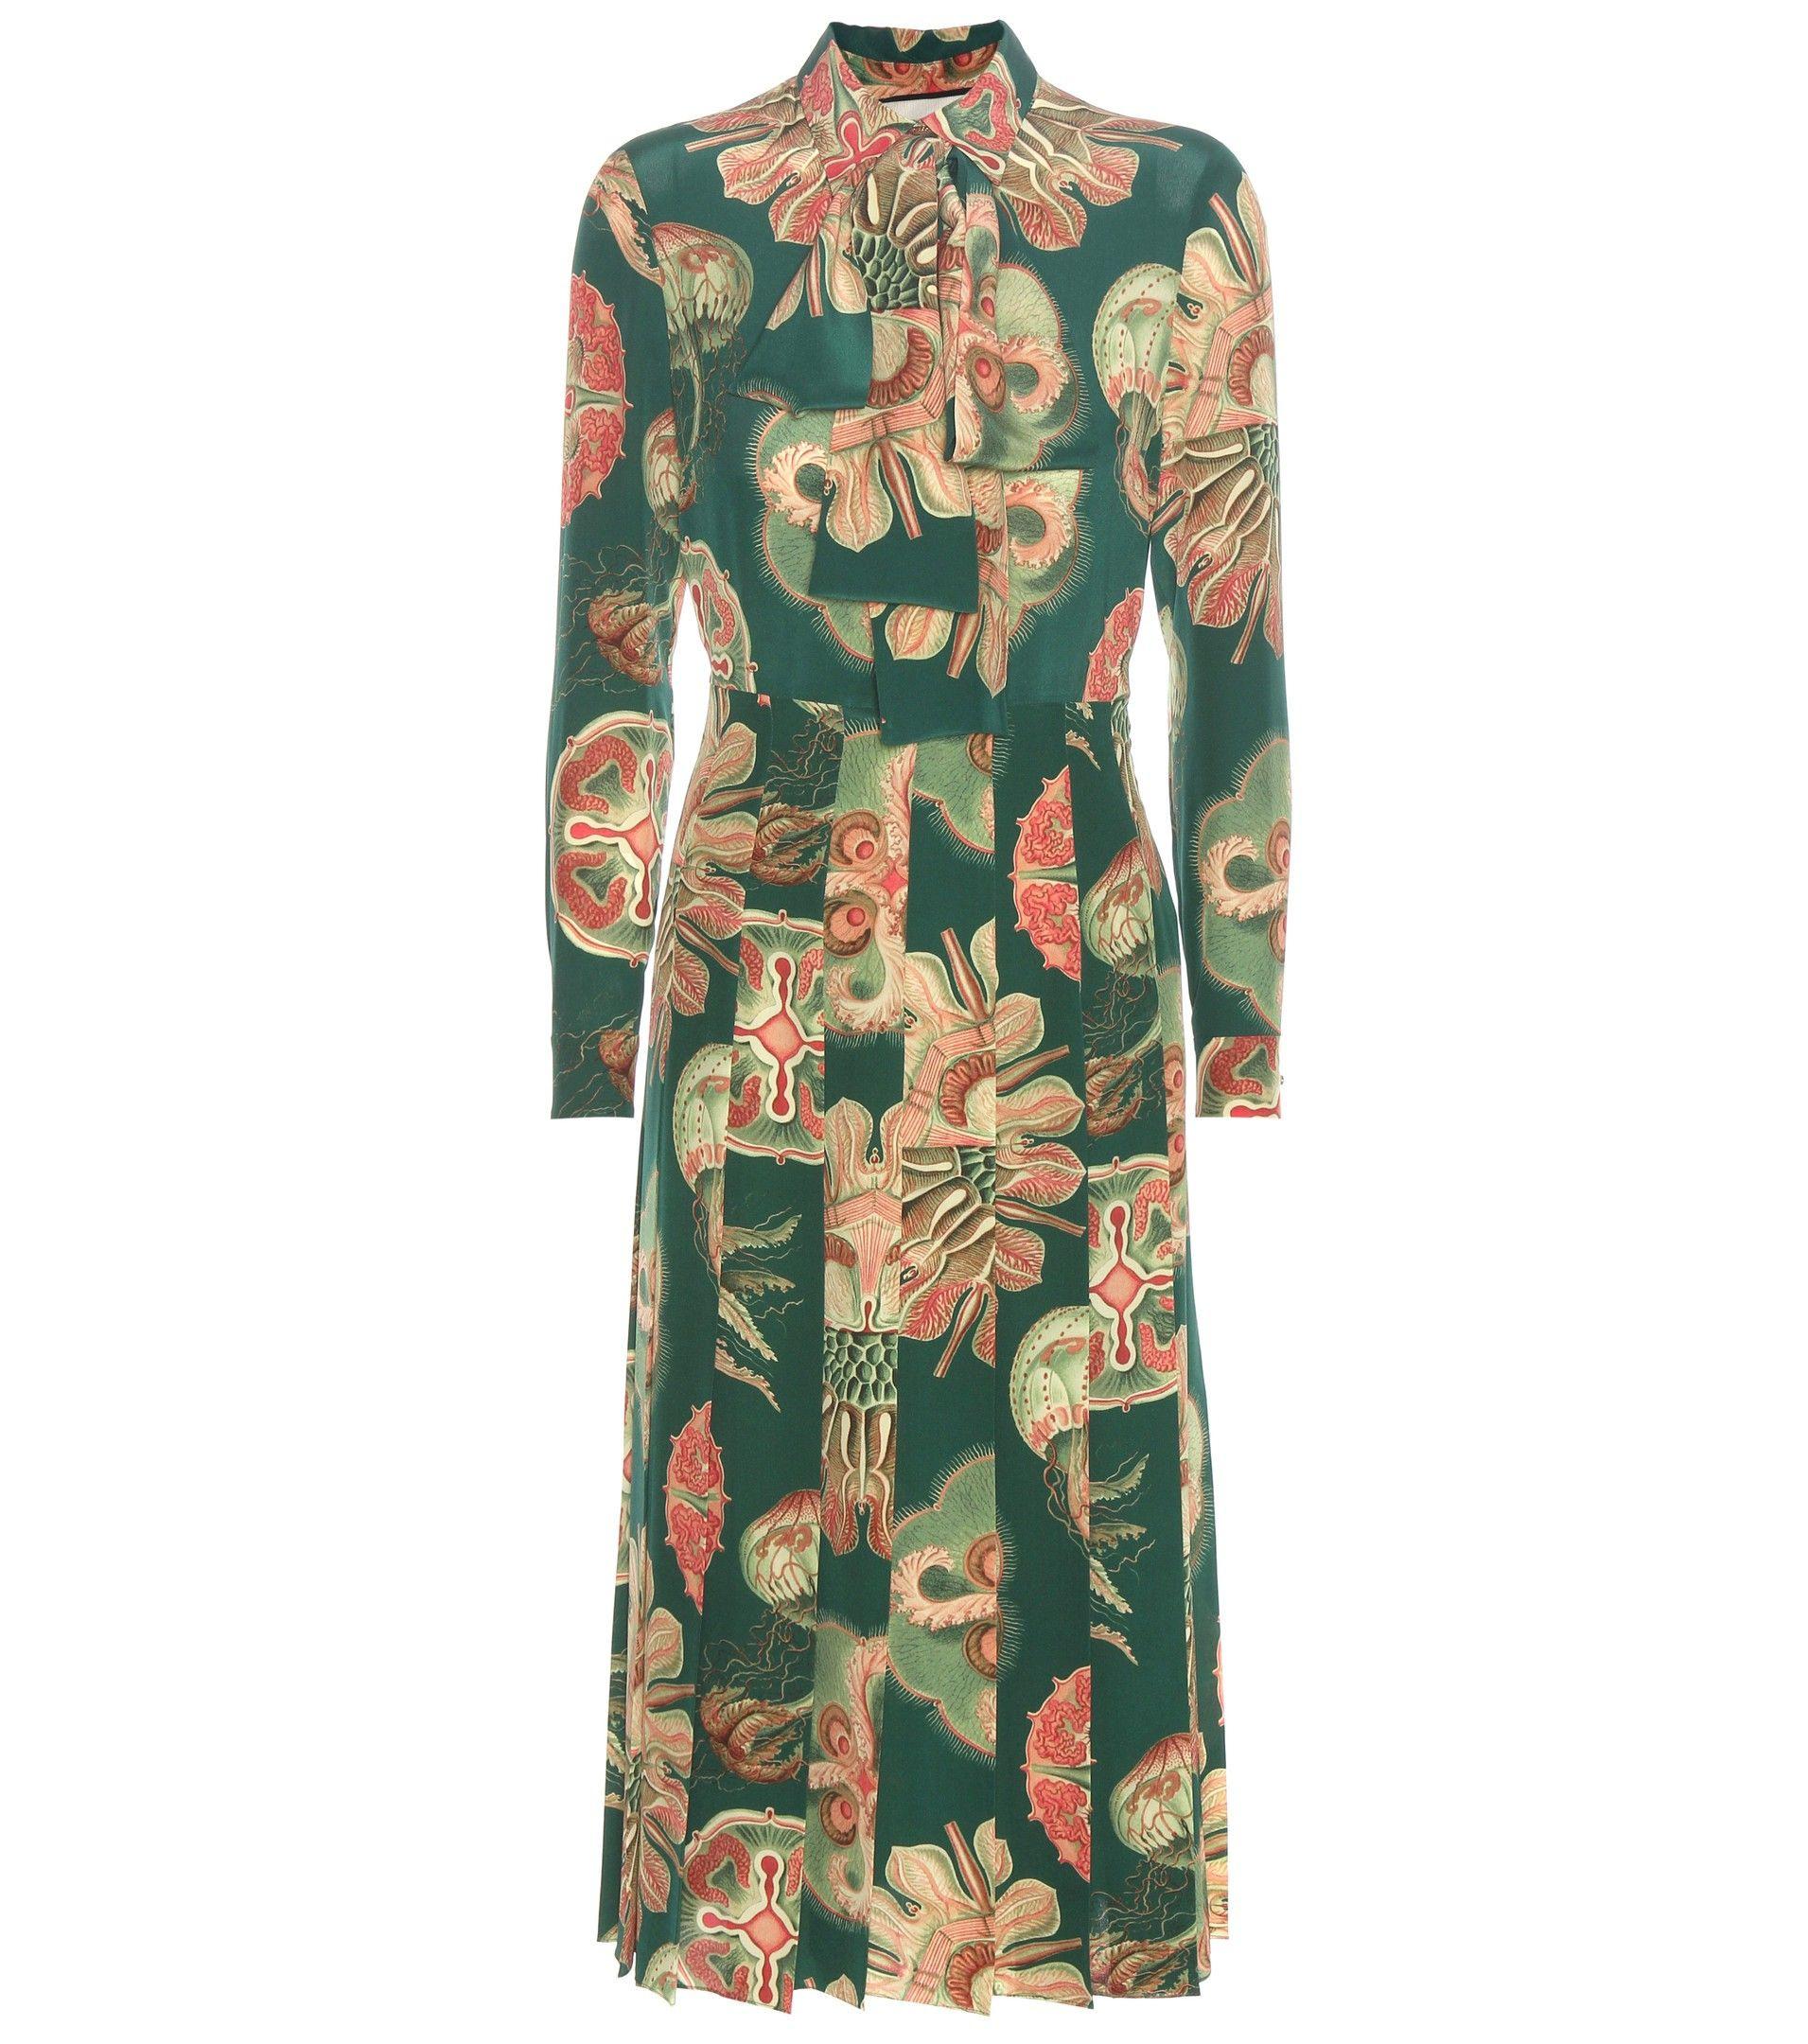 Gucci  Bedrucktes Kleid Aus Seide  Mytheresa